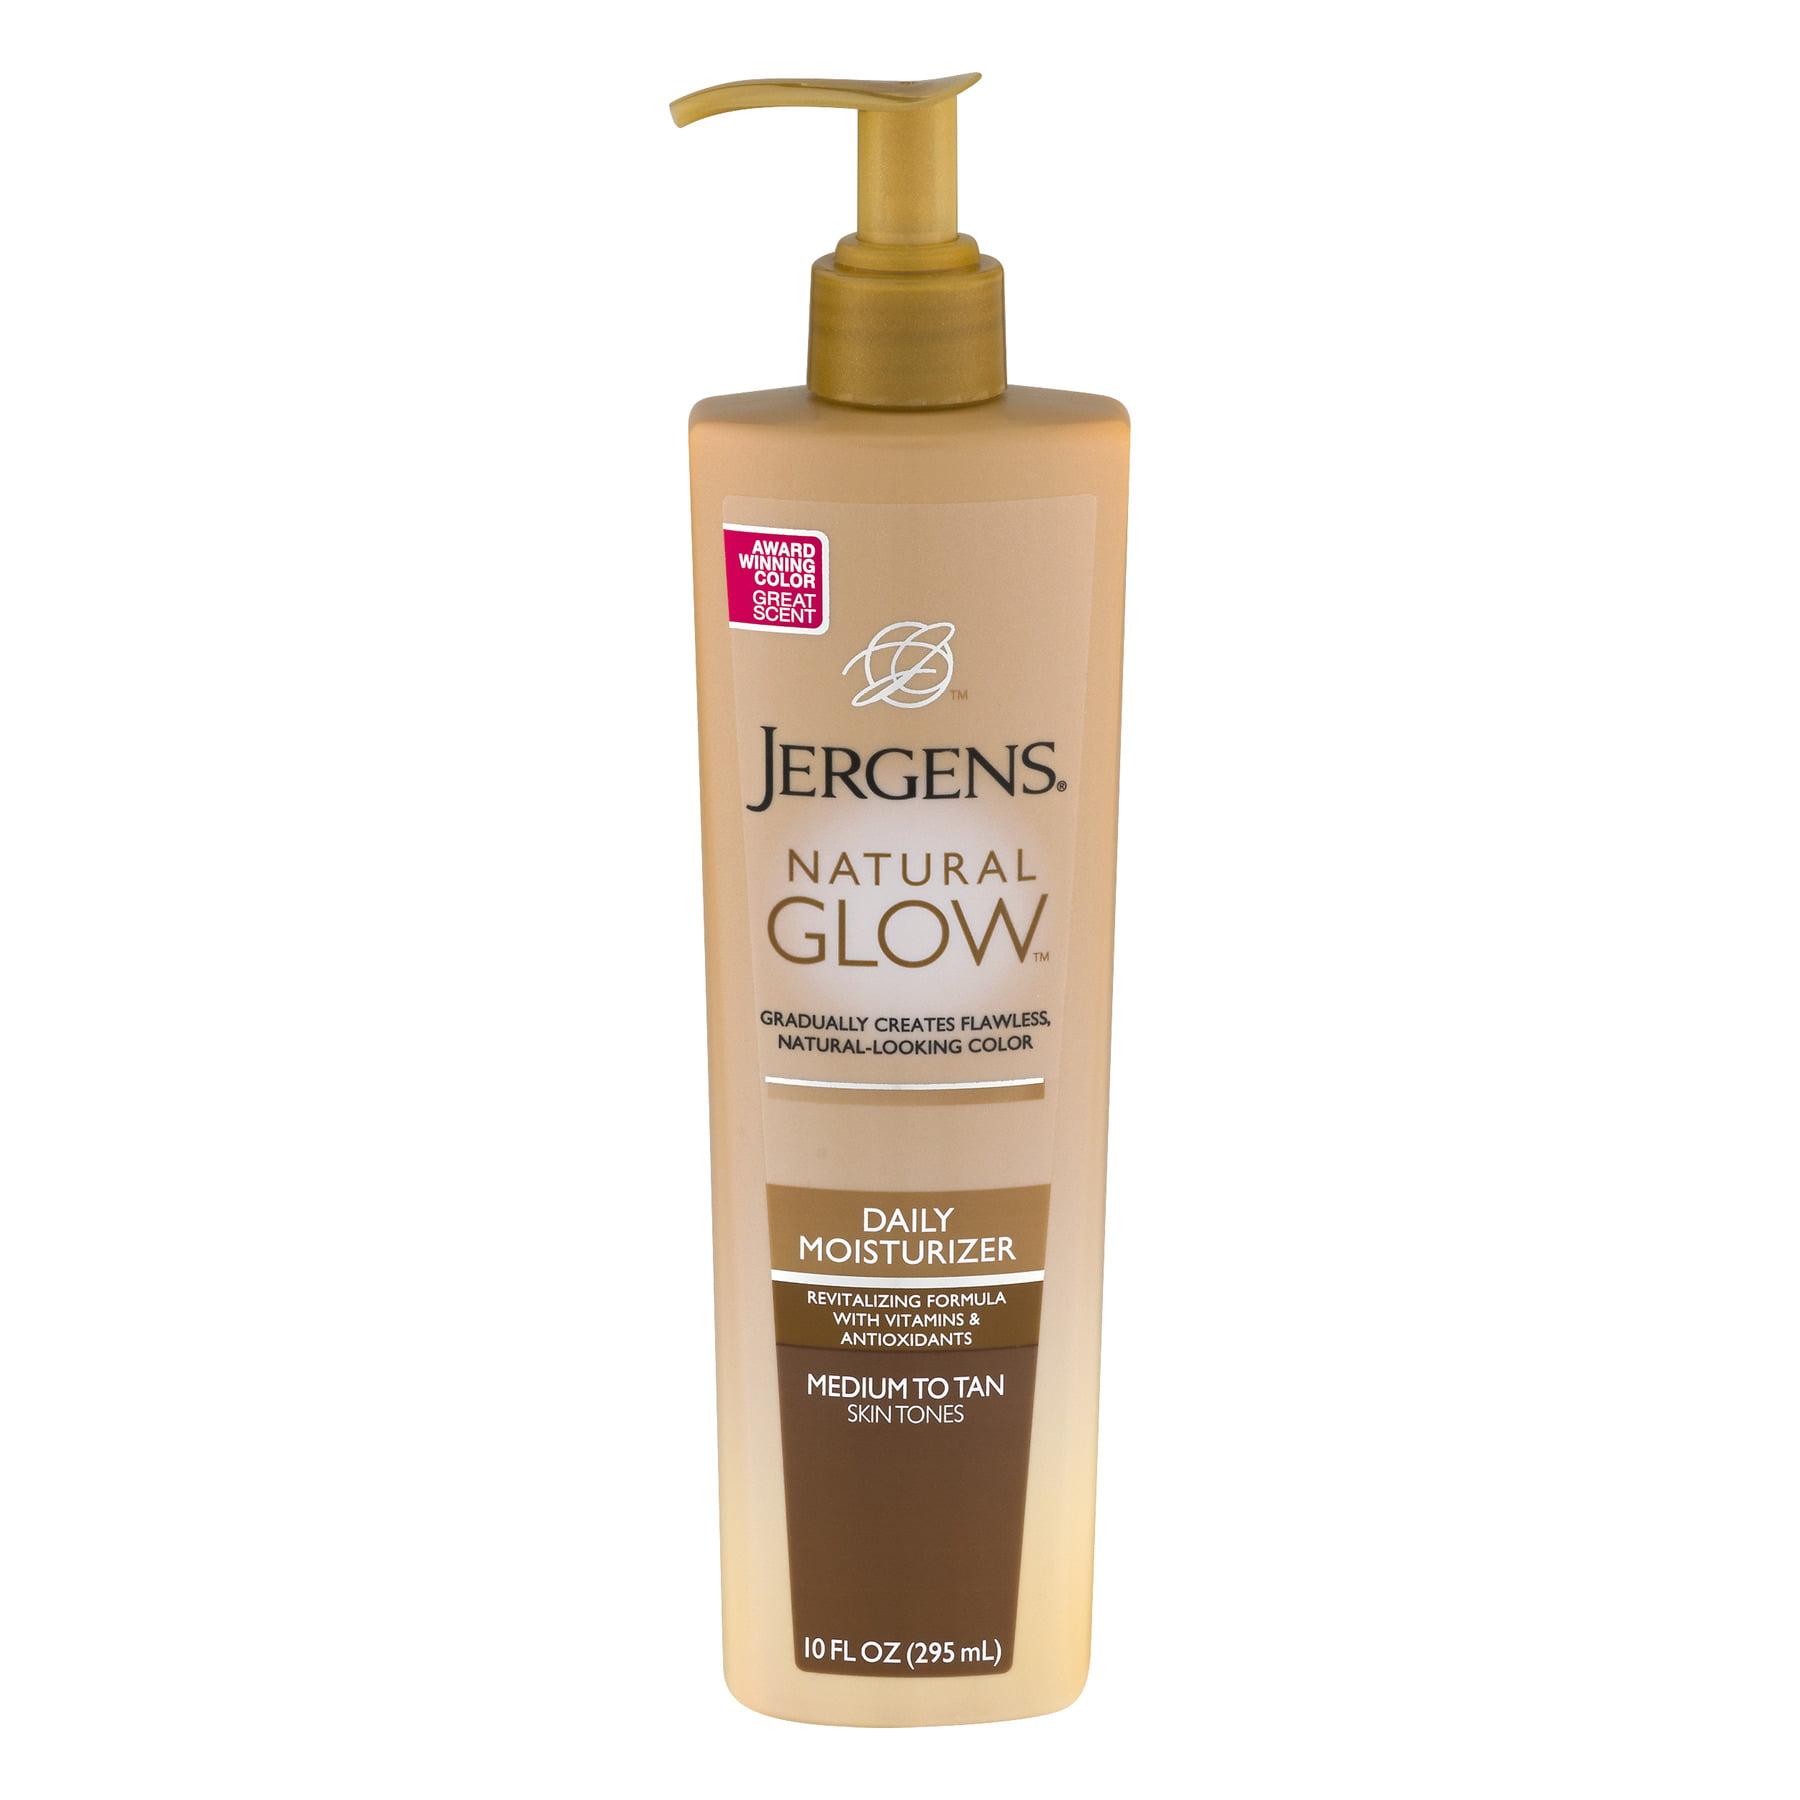 Jergens Natural Glow Medium to Tan Skin Tones Daily Moisturizer 10 fl. oz. Pump